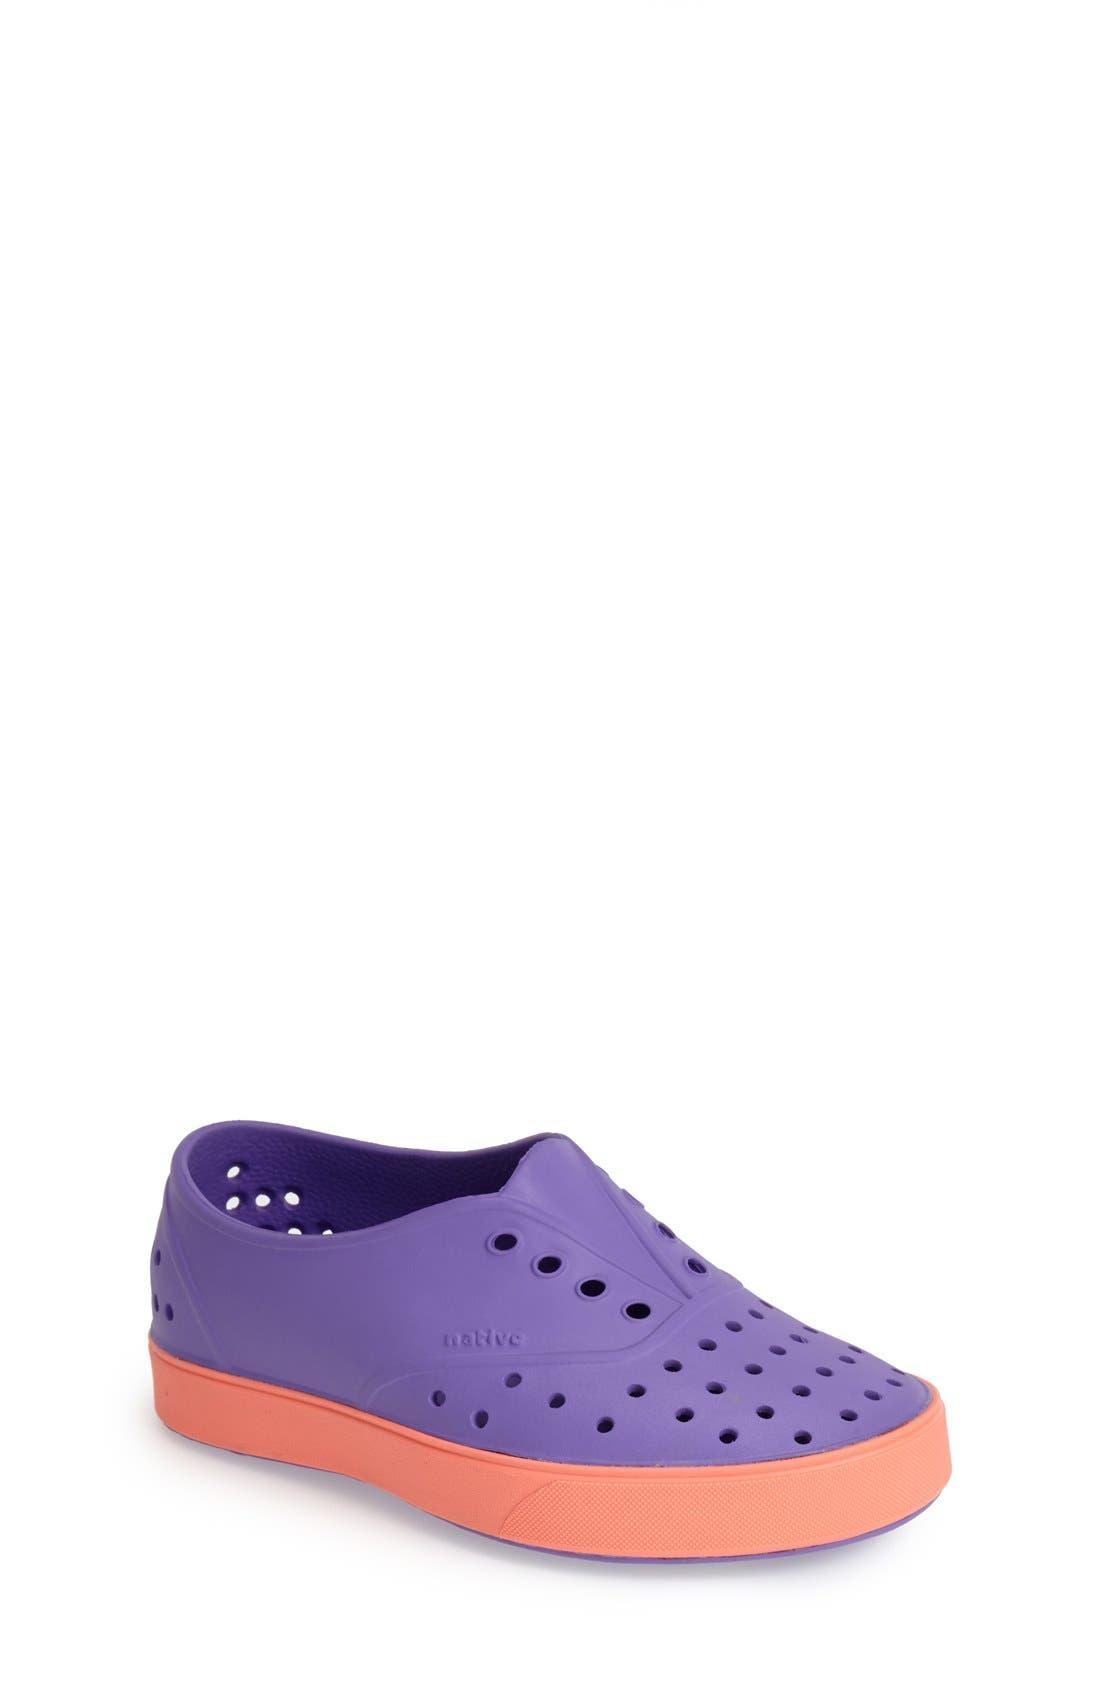 Miller Water Friendly Slip-On Sneaker,                             Main thumbnail 20, color,